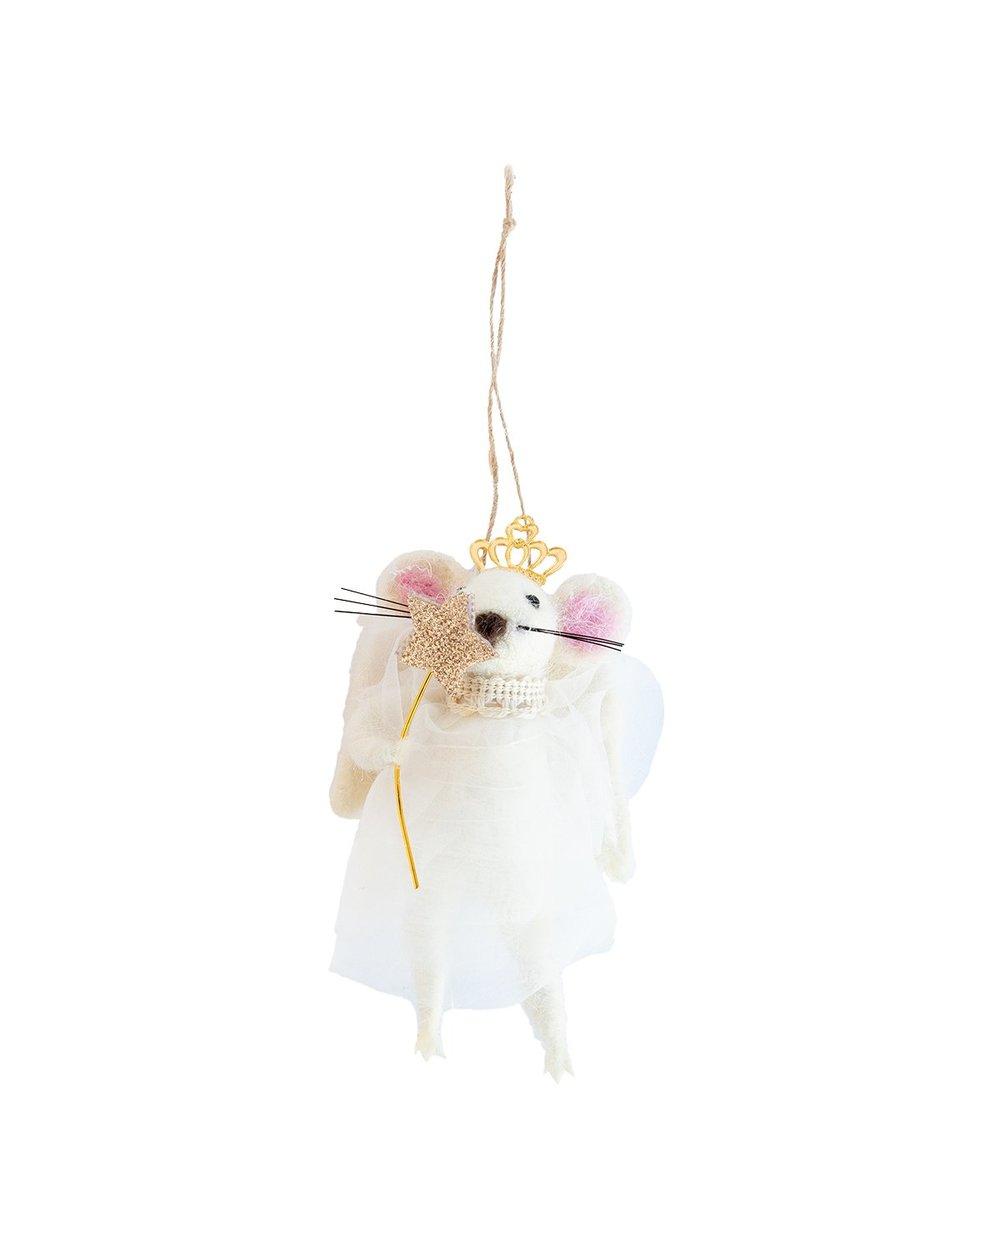 Mouse_Ornament_1.jpg